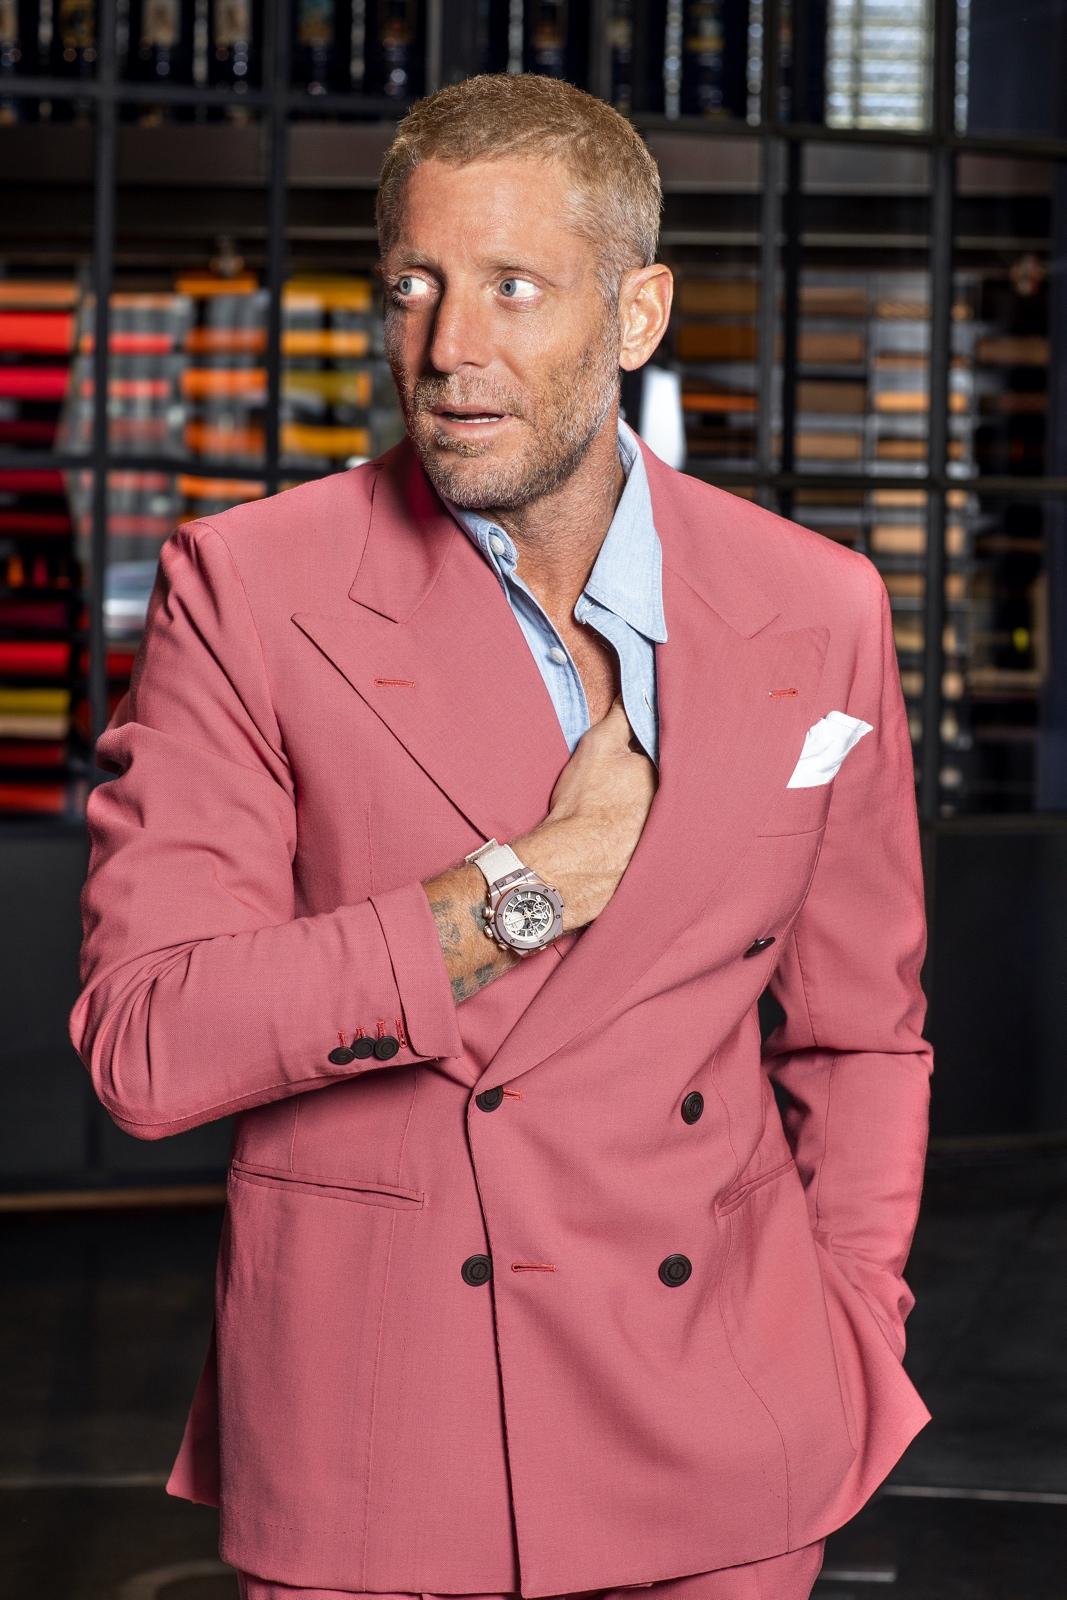 Lapo Elkann - Founder & Creative Chairman of Garage Italia - wearing the Big Bang Millennial Pink (2)